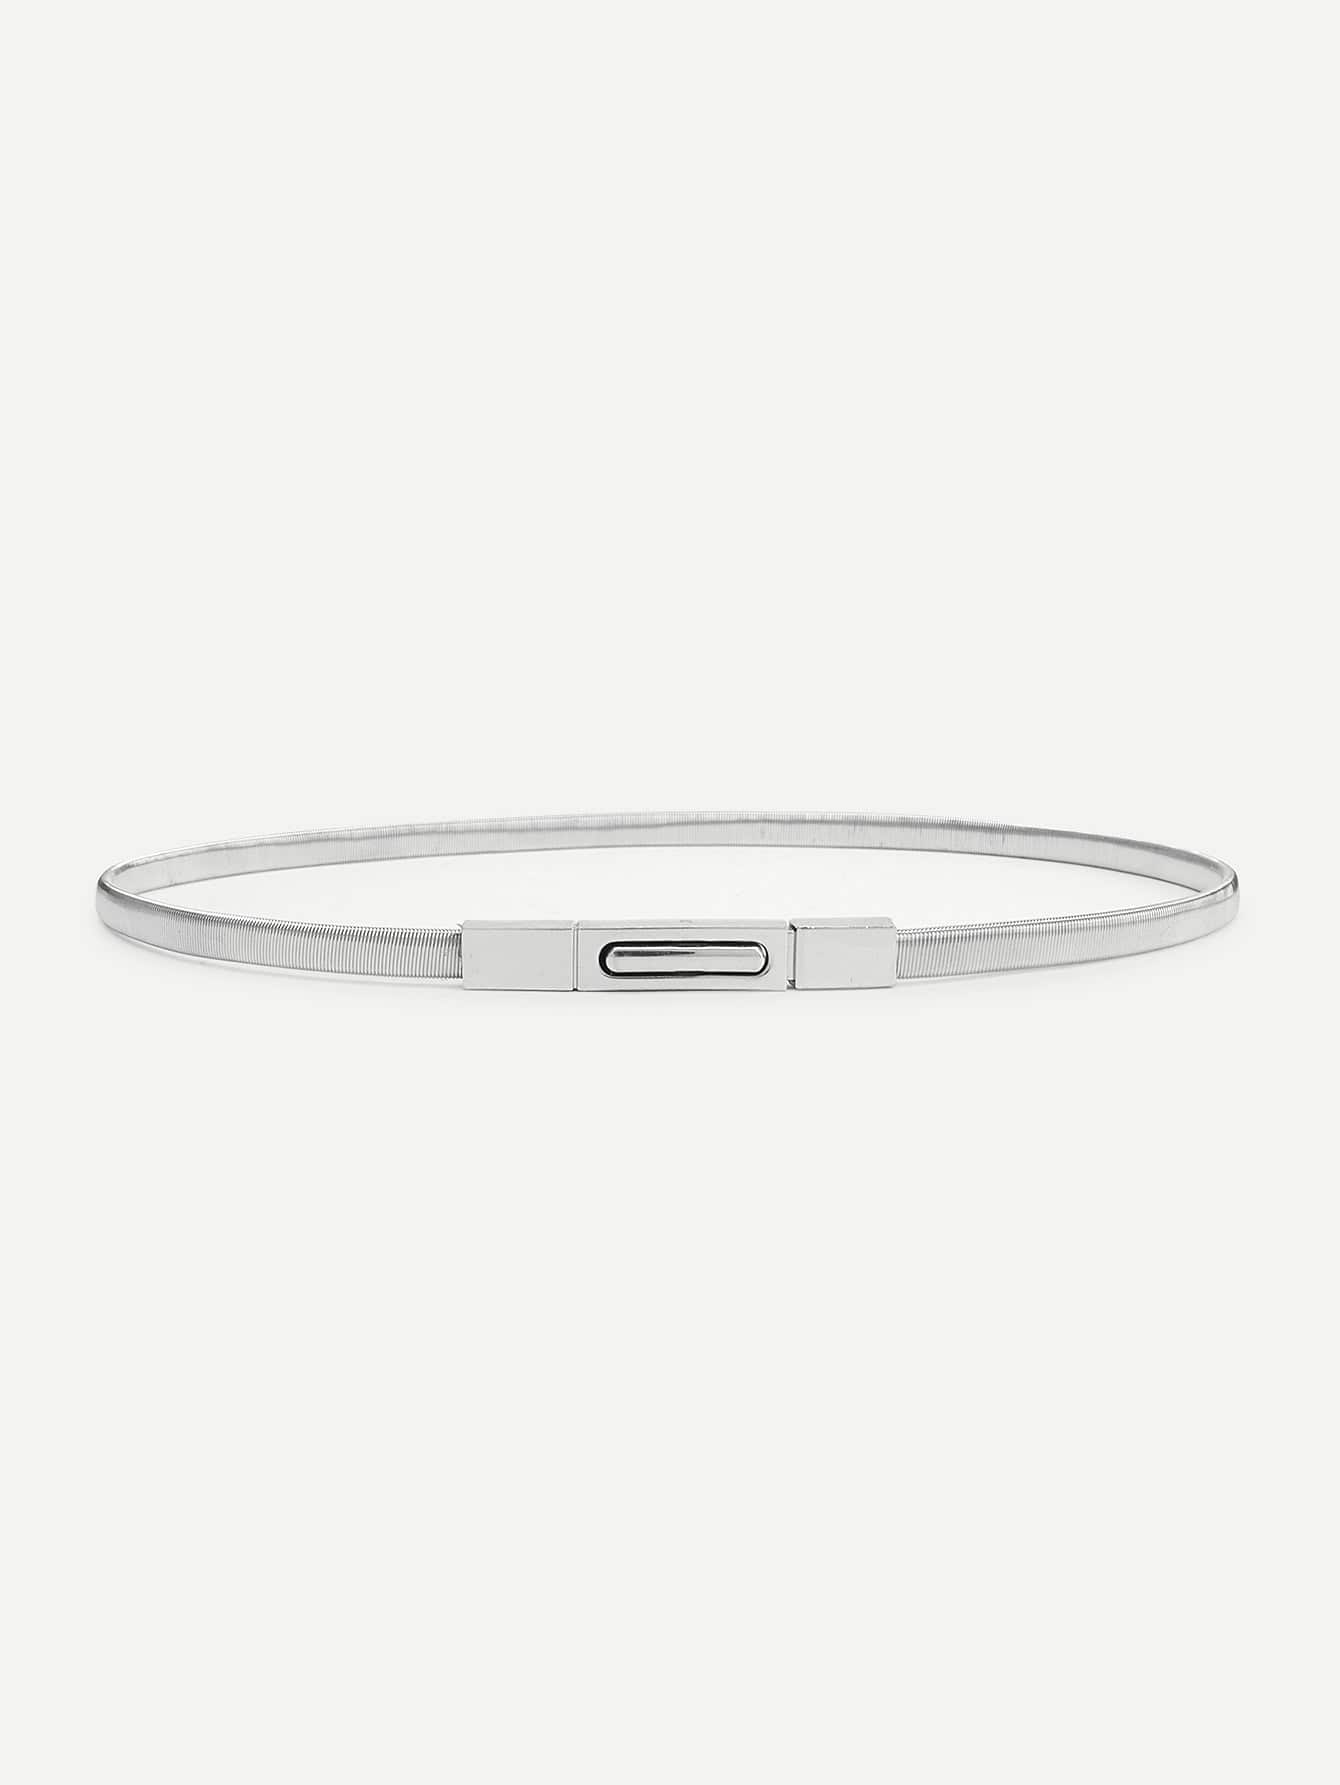 Metallic Skinny Belt metallic woven belt 2pcs